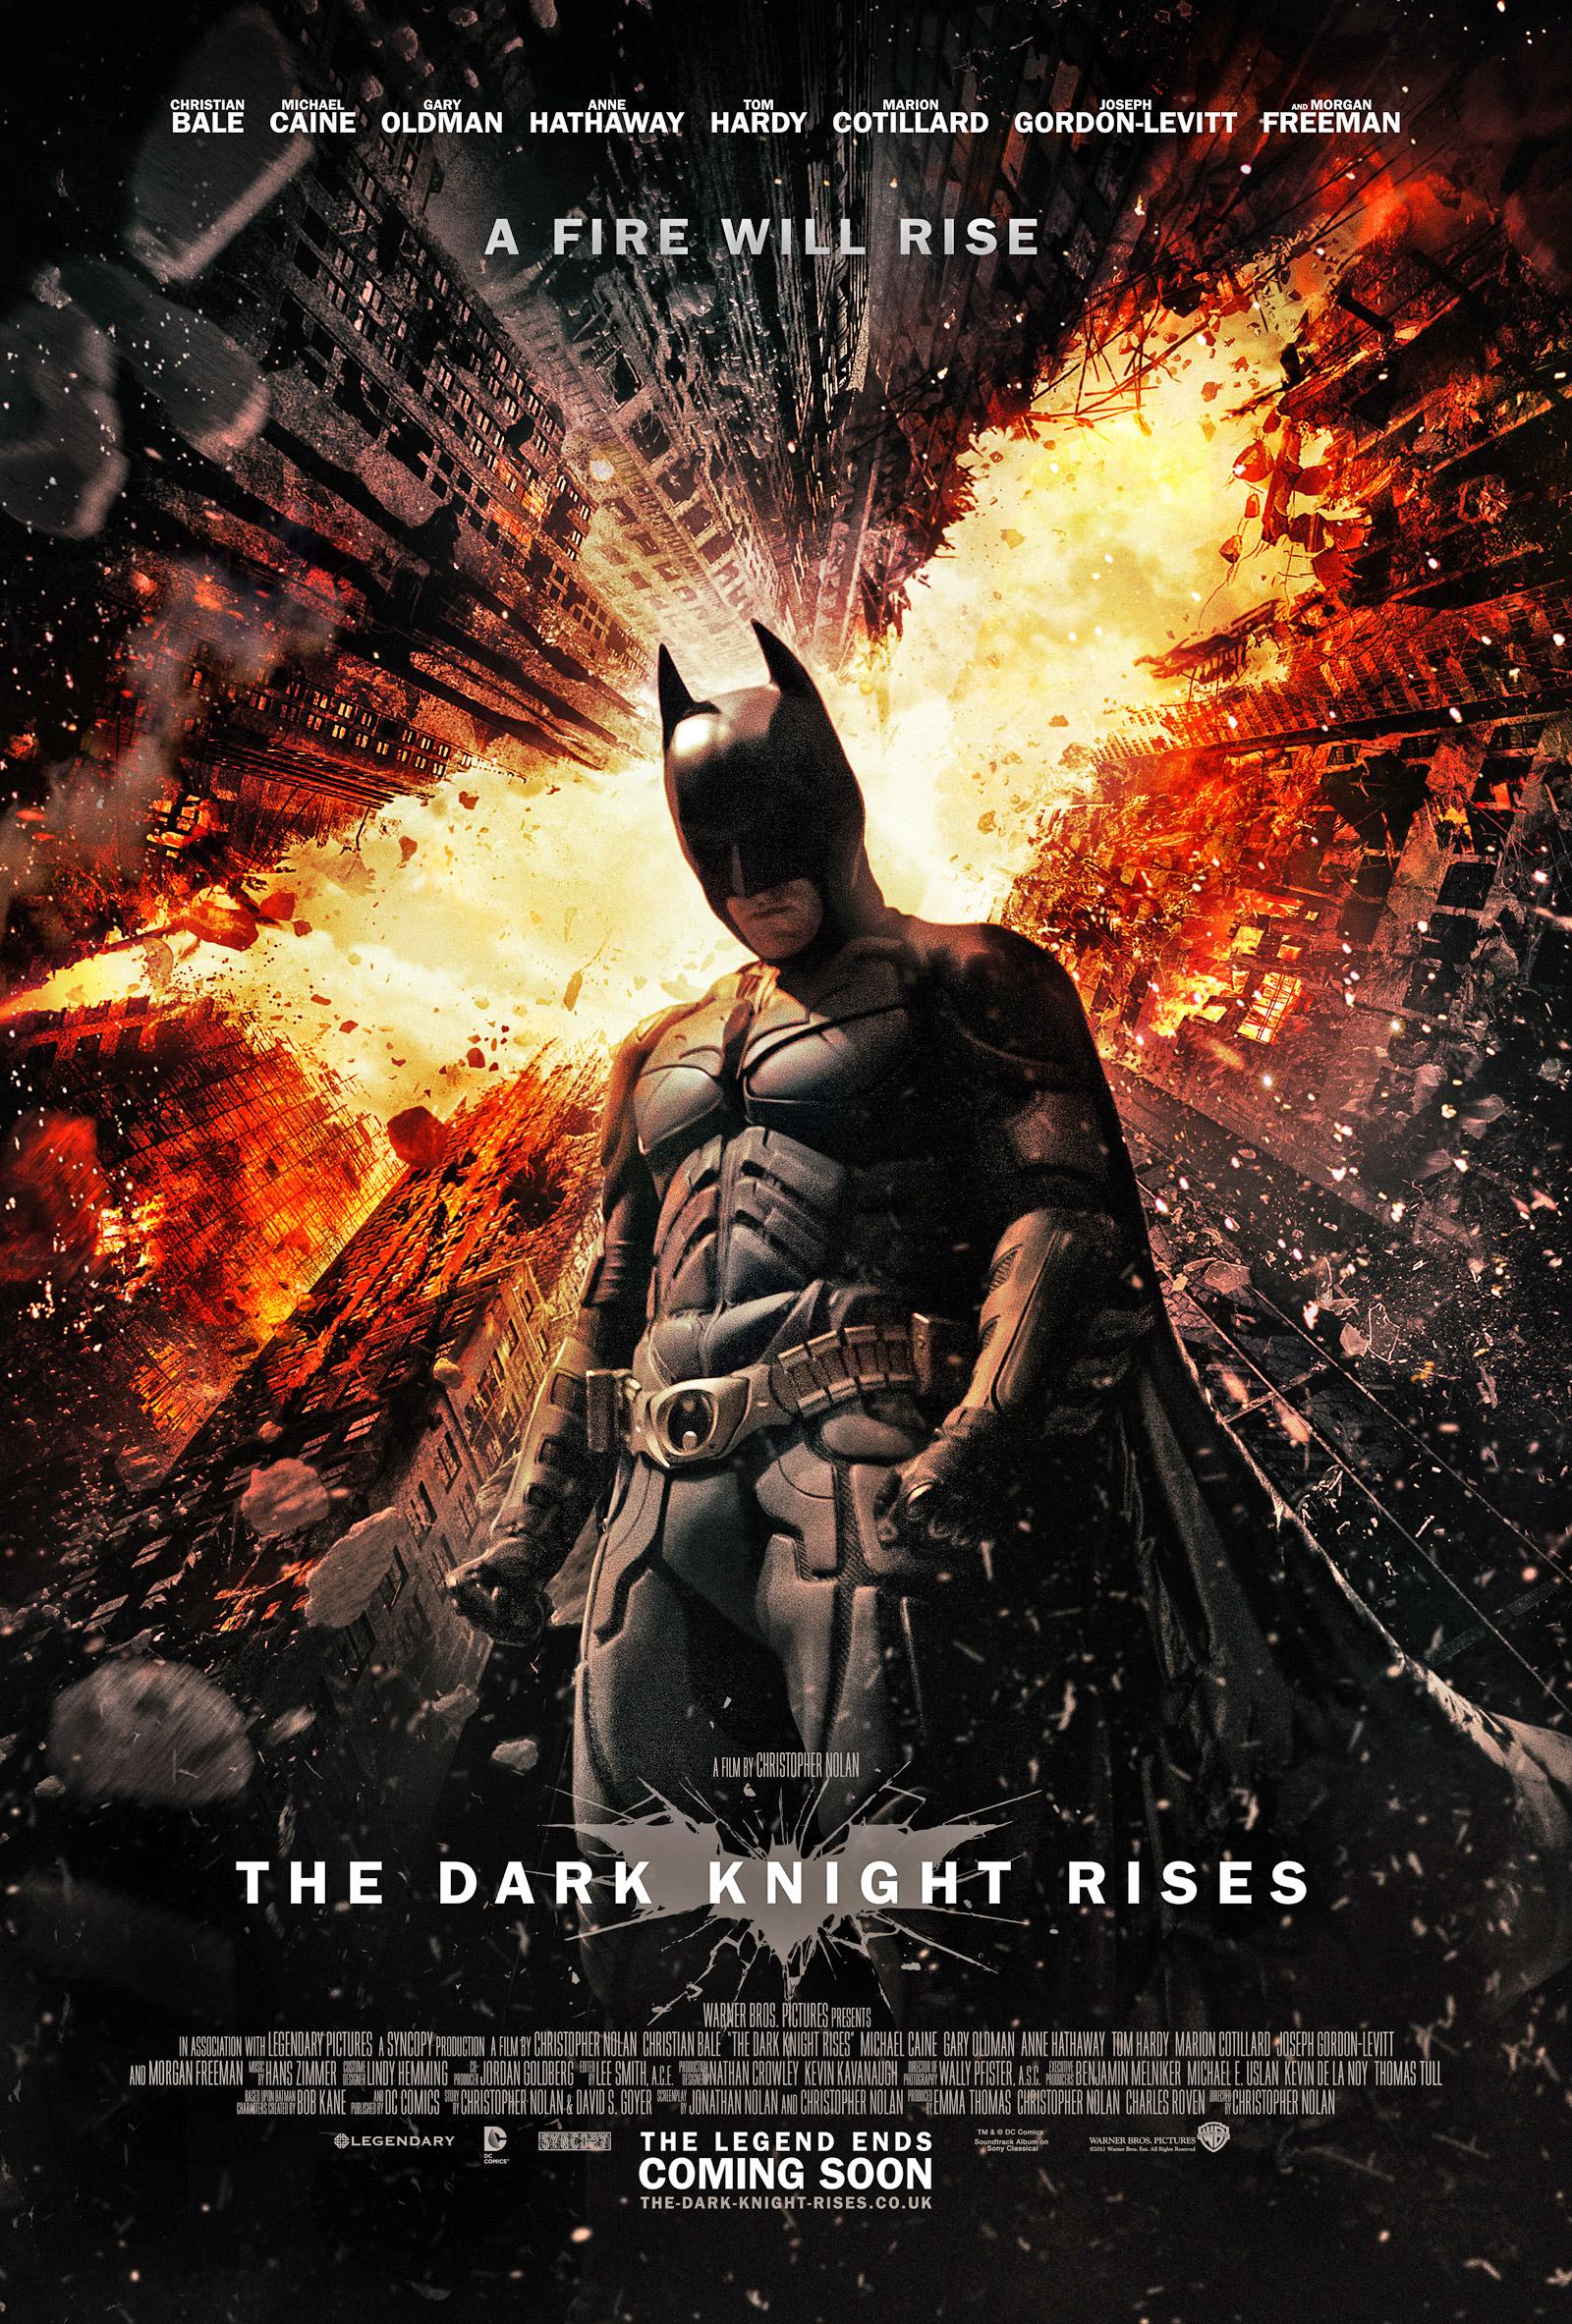 The_Dark_Knight_Rises_poster.jpg